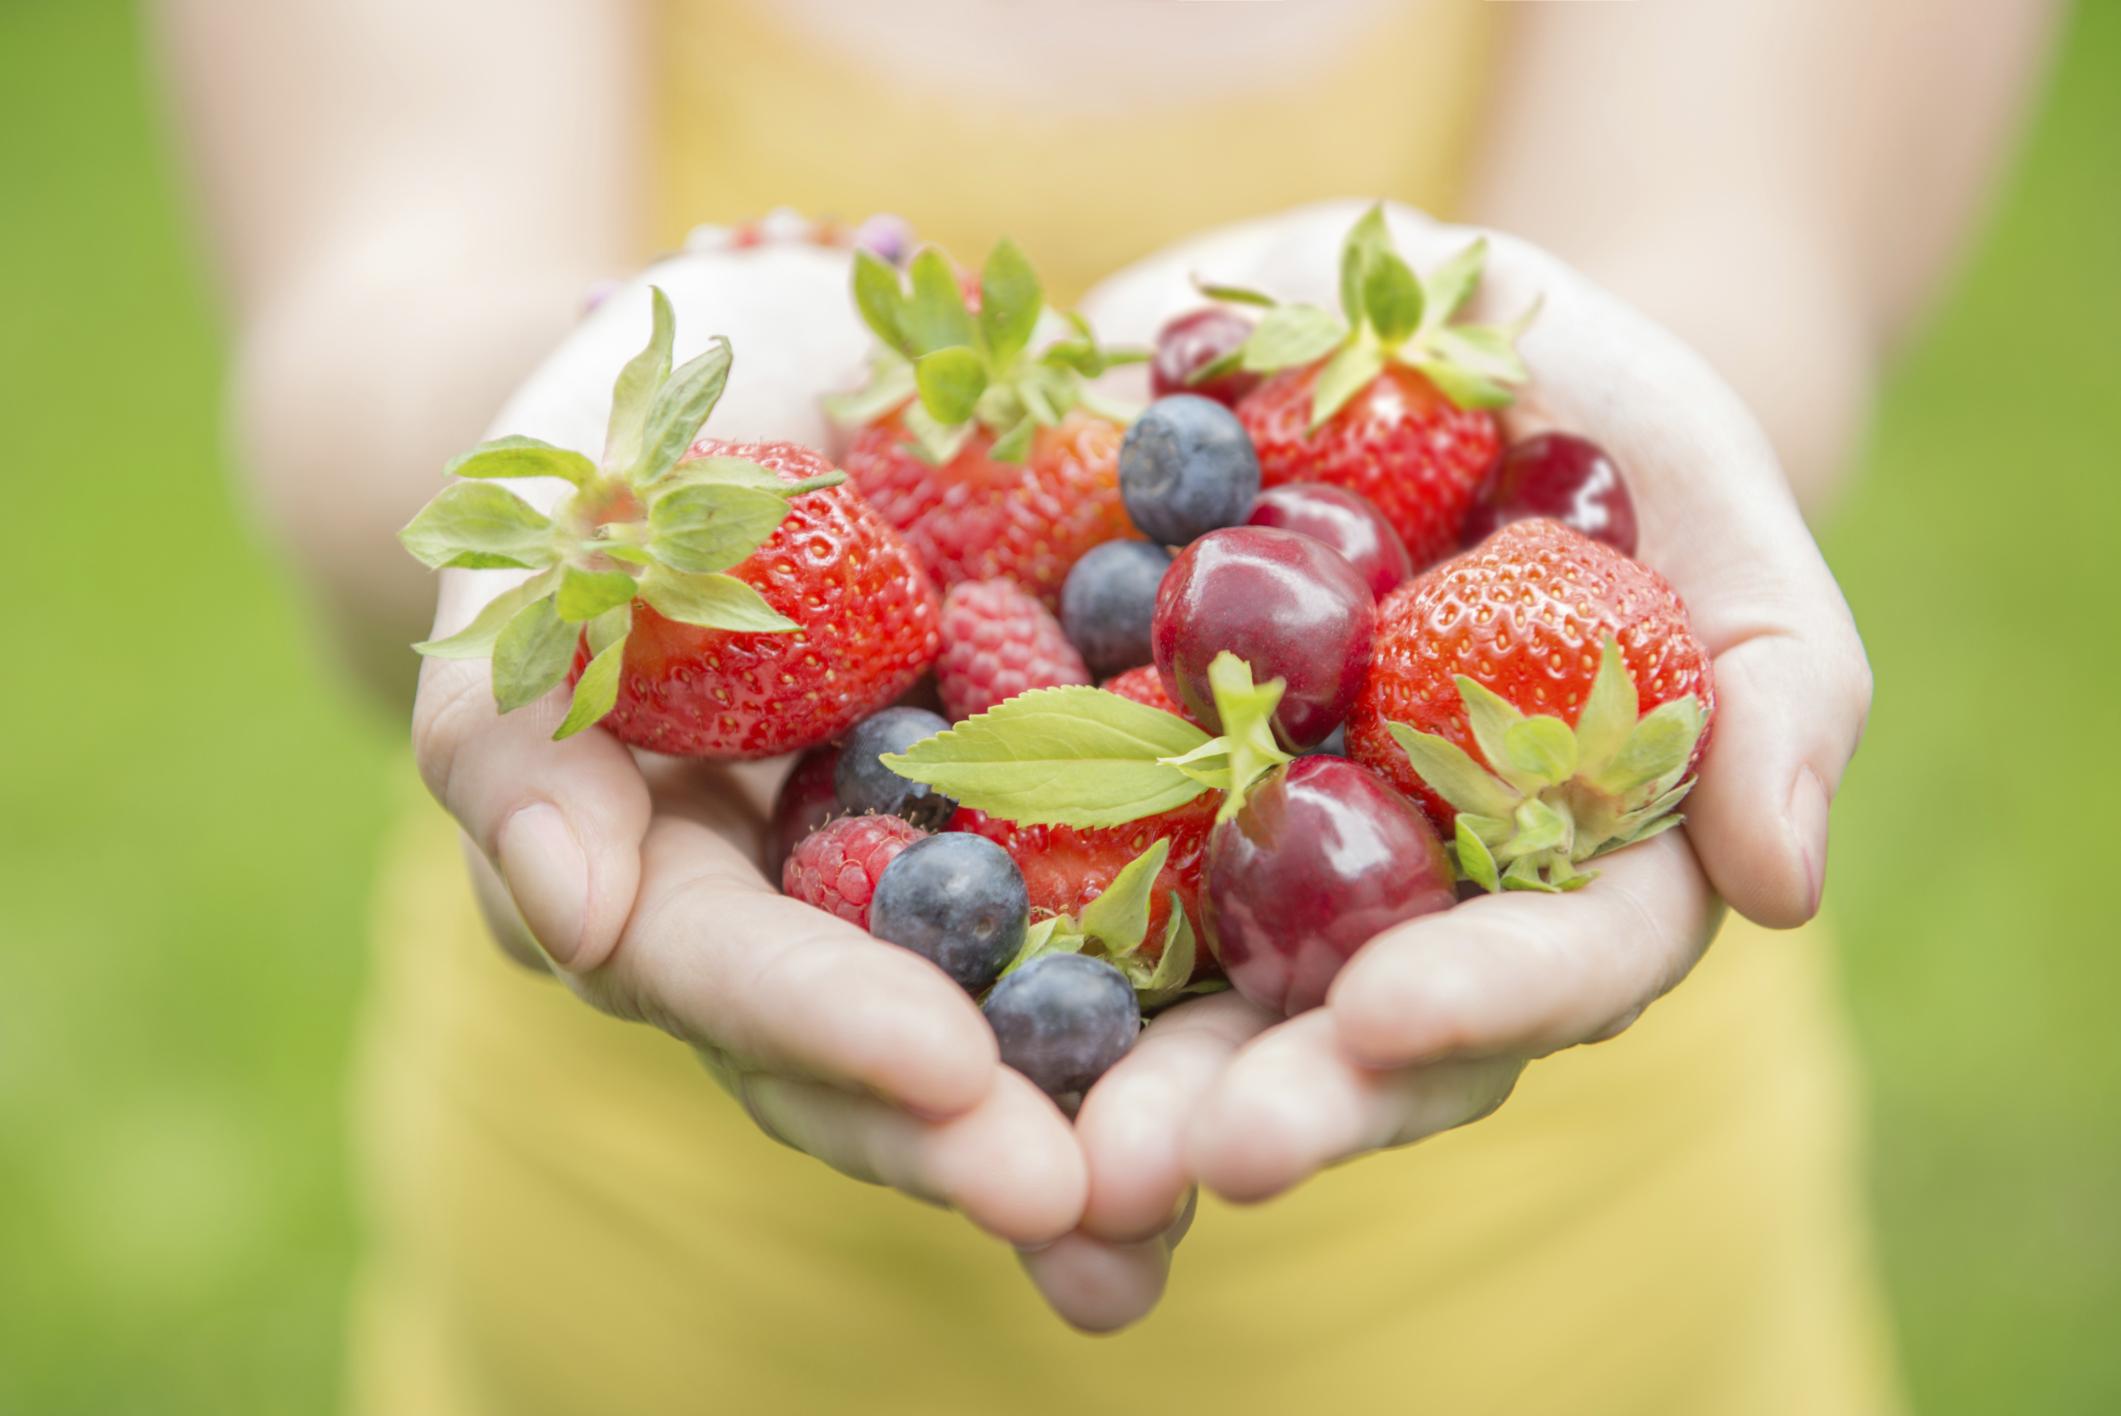 fruits_-_healthy_lifestyle.jpg